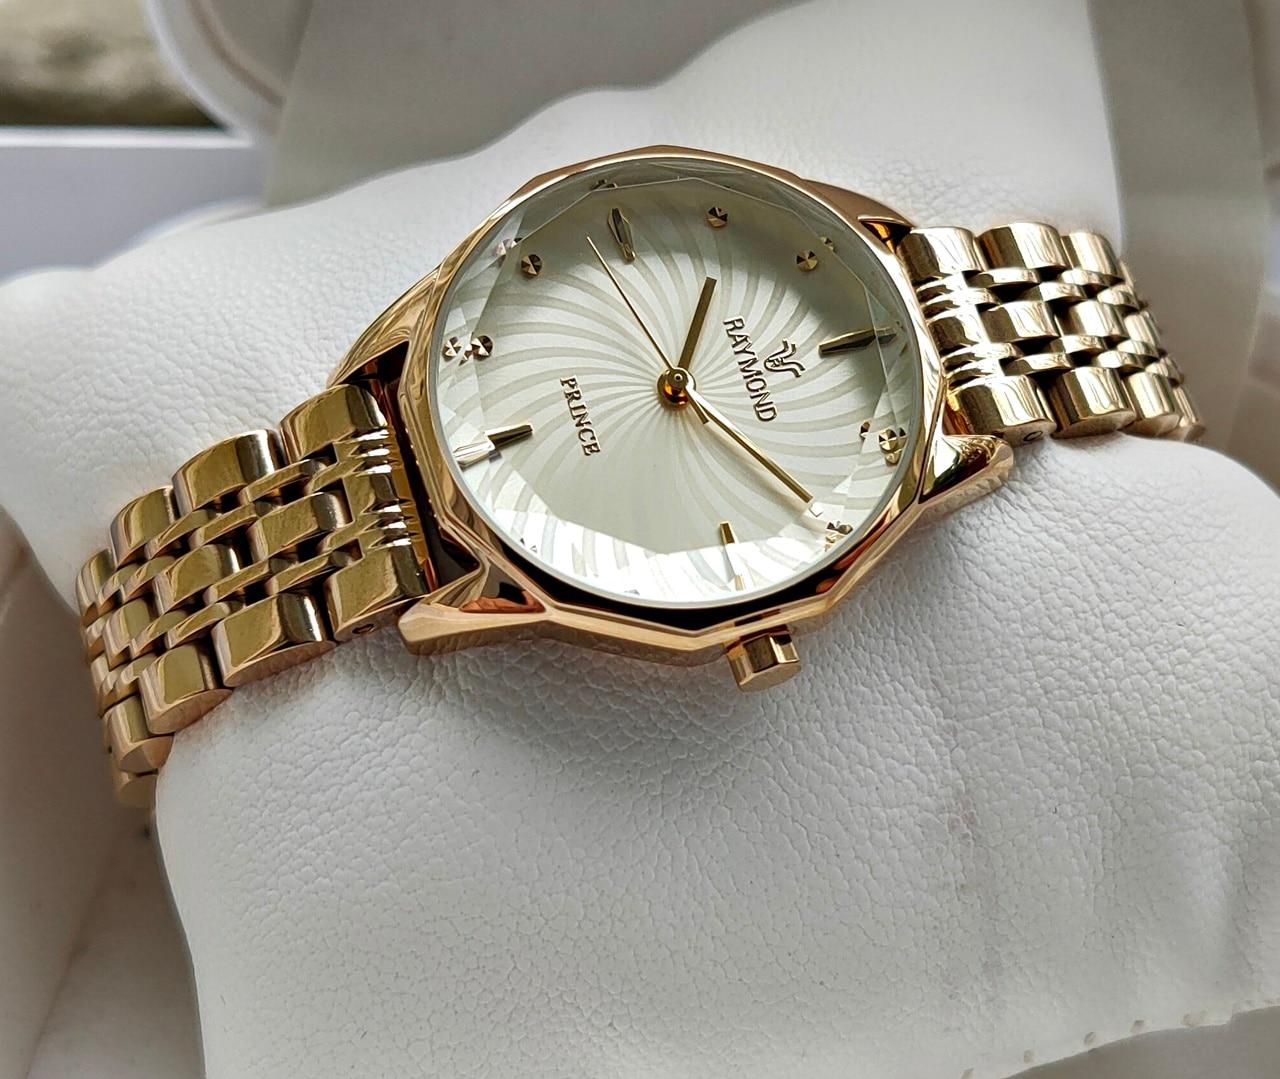 Raymond Swiss Prism Glass Design New Season Women 'S Wristwatch Classic Stylish Model Europe America Fashion Watches Swiss Watches enlarge